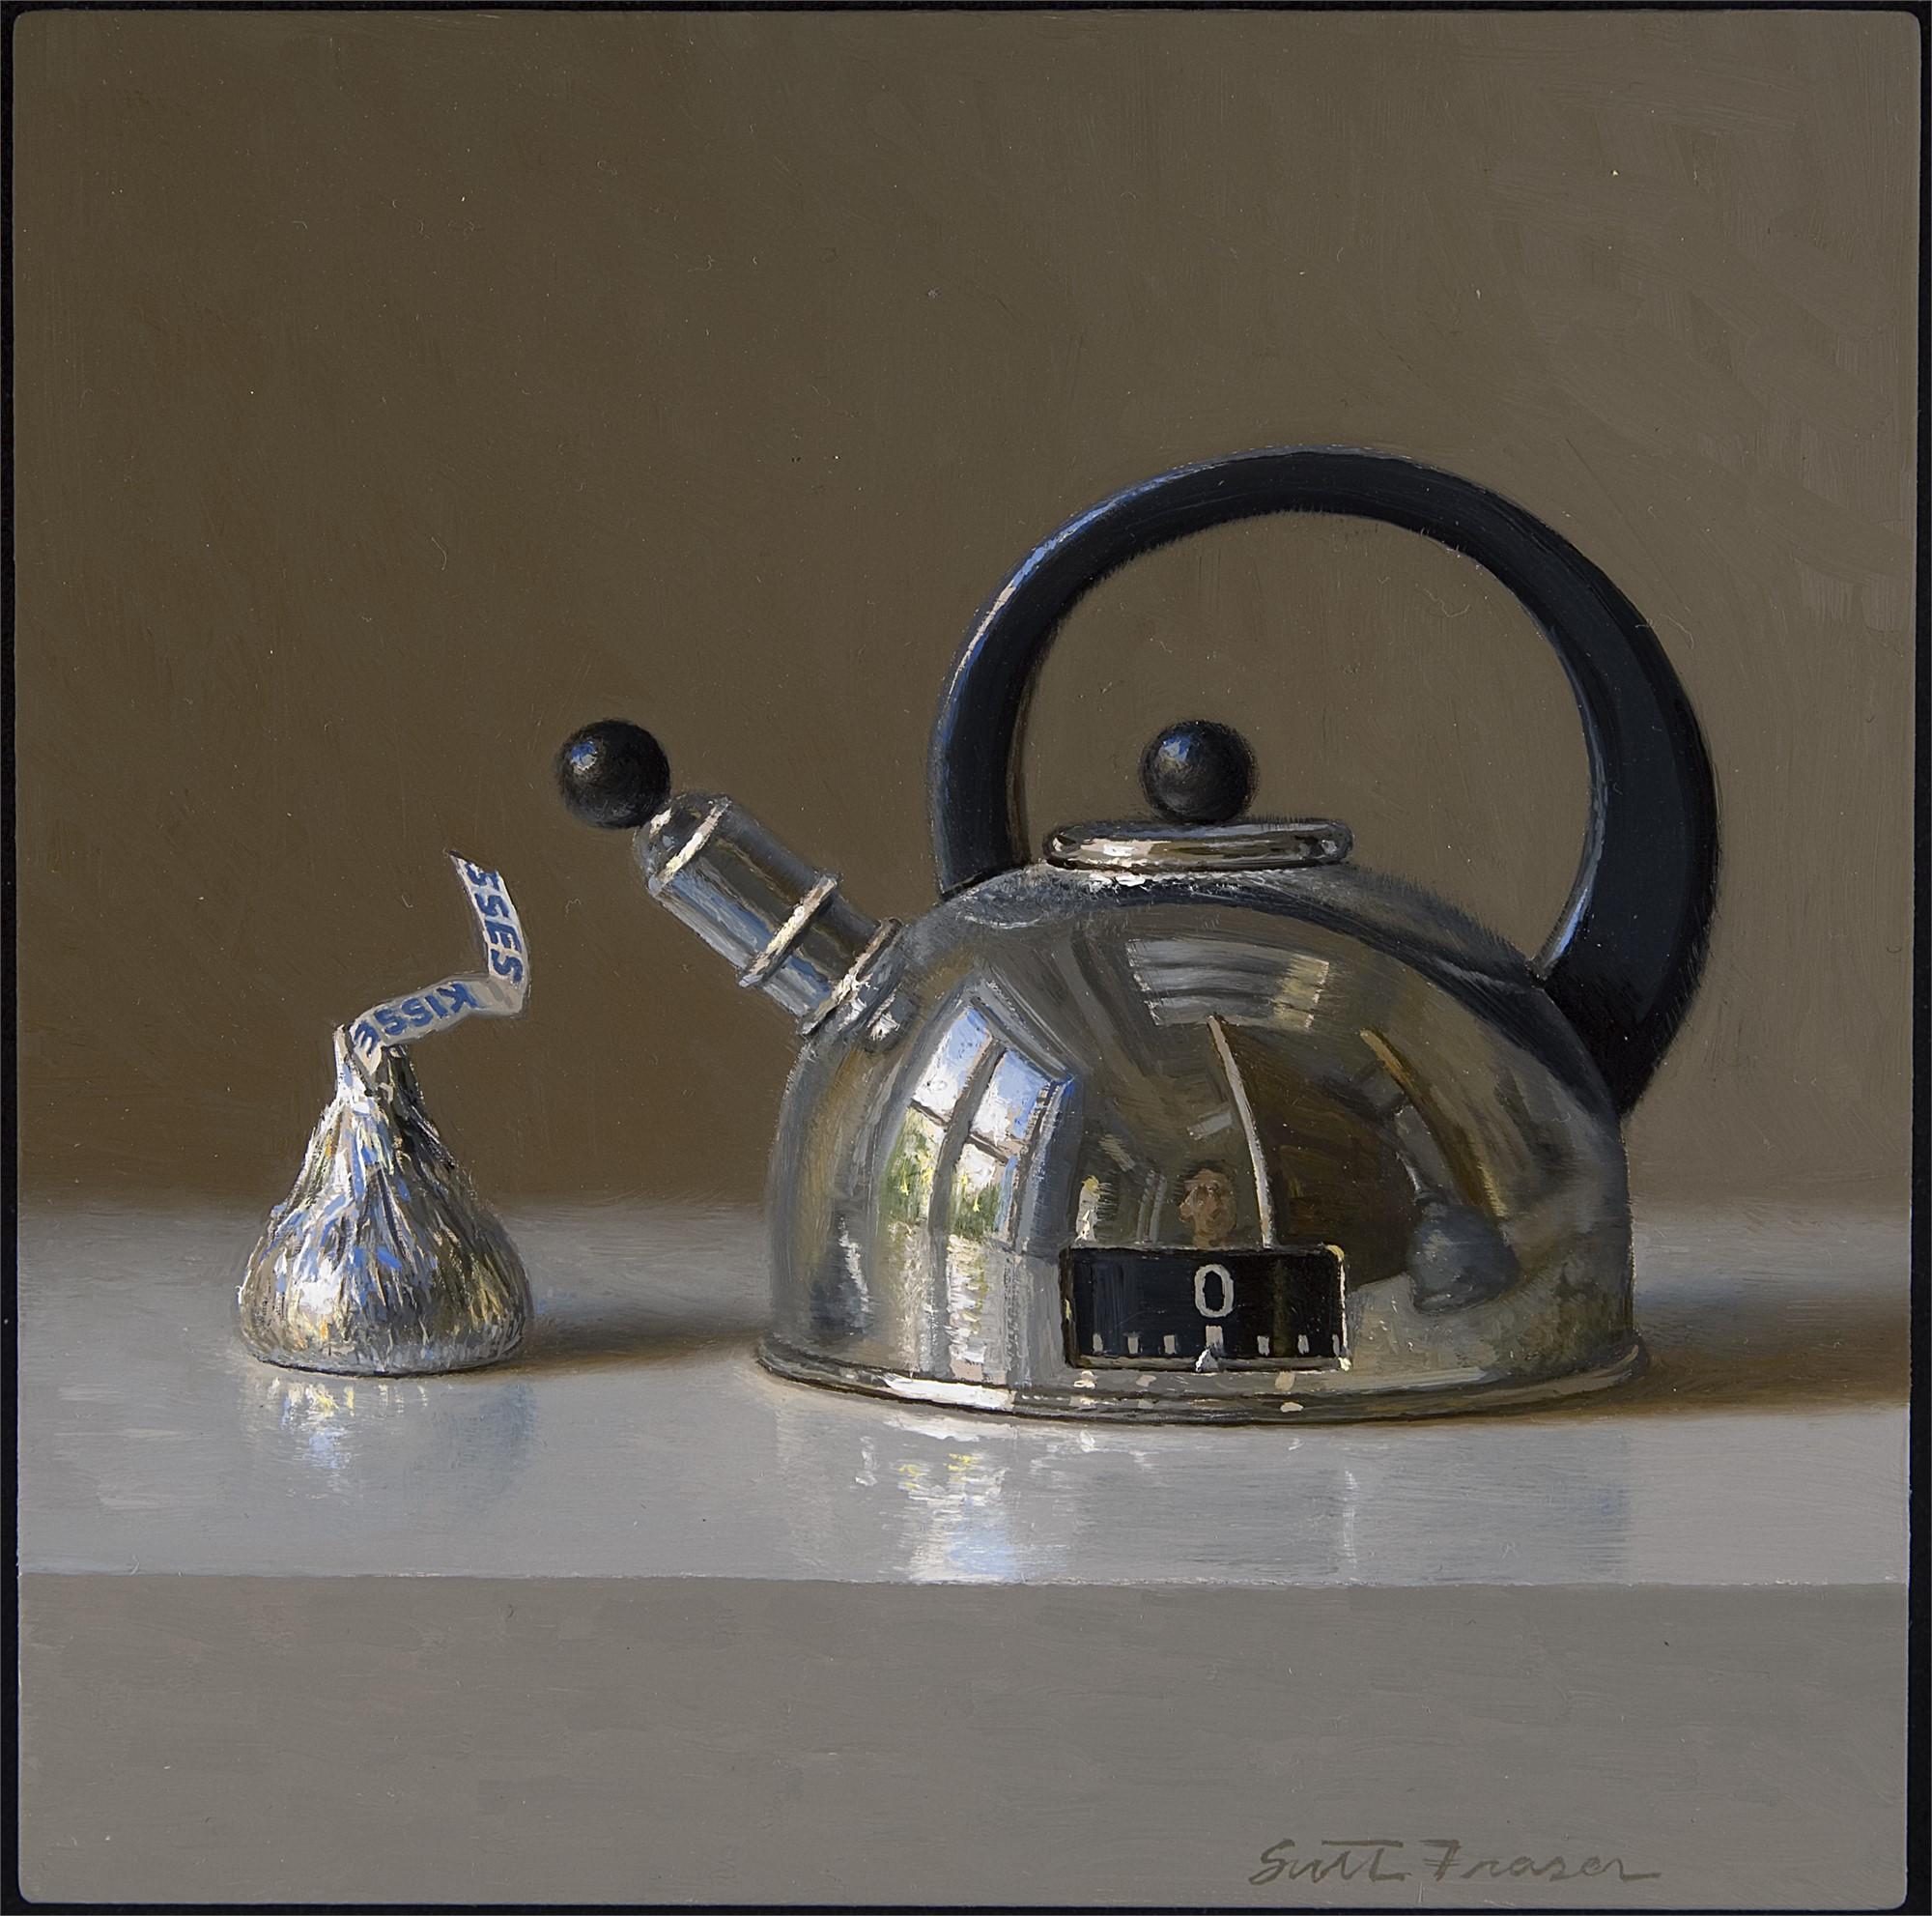 Teapot Kiss by Scott Fraser